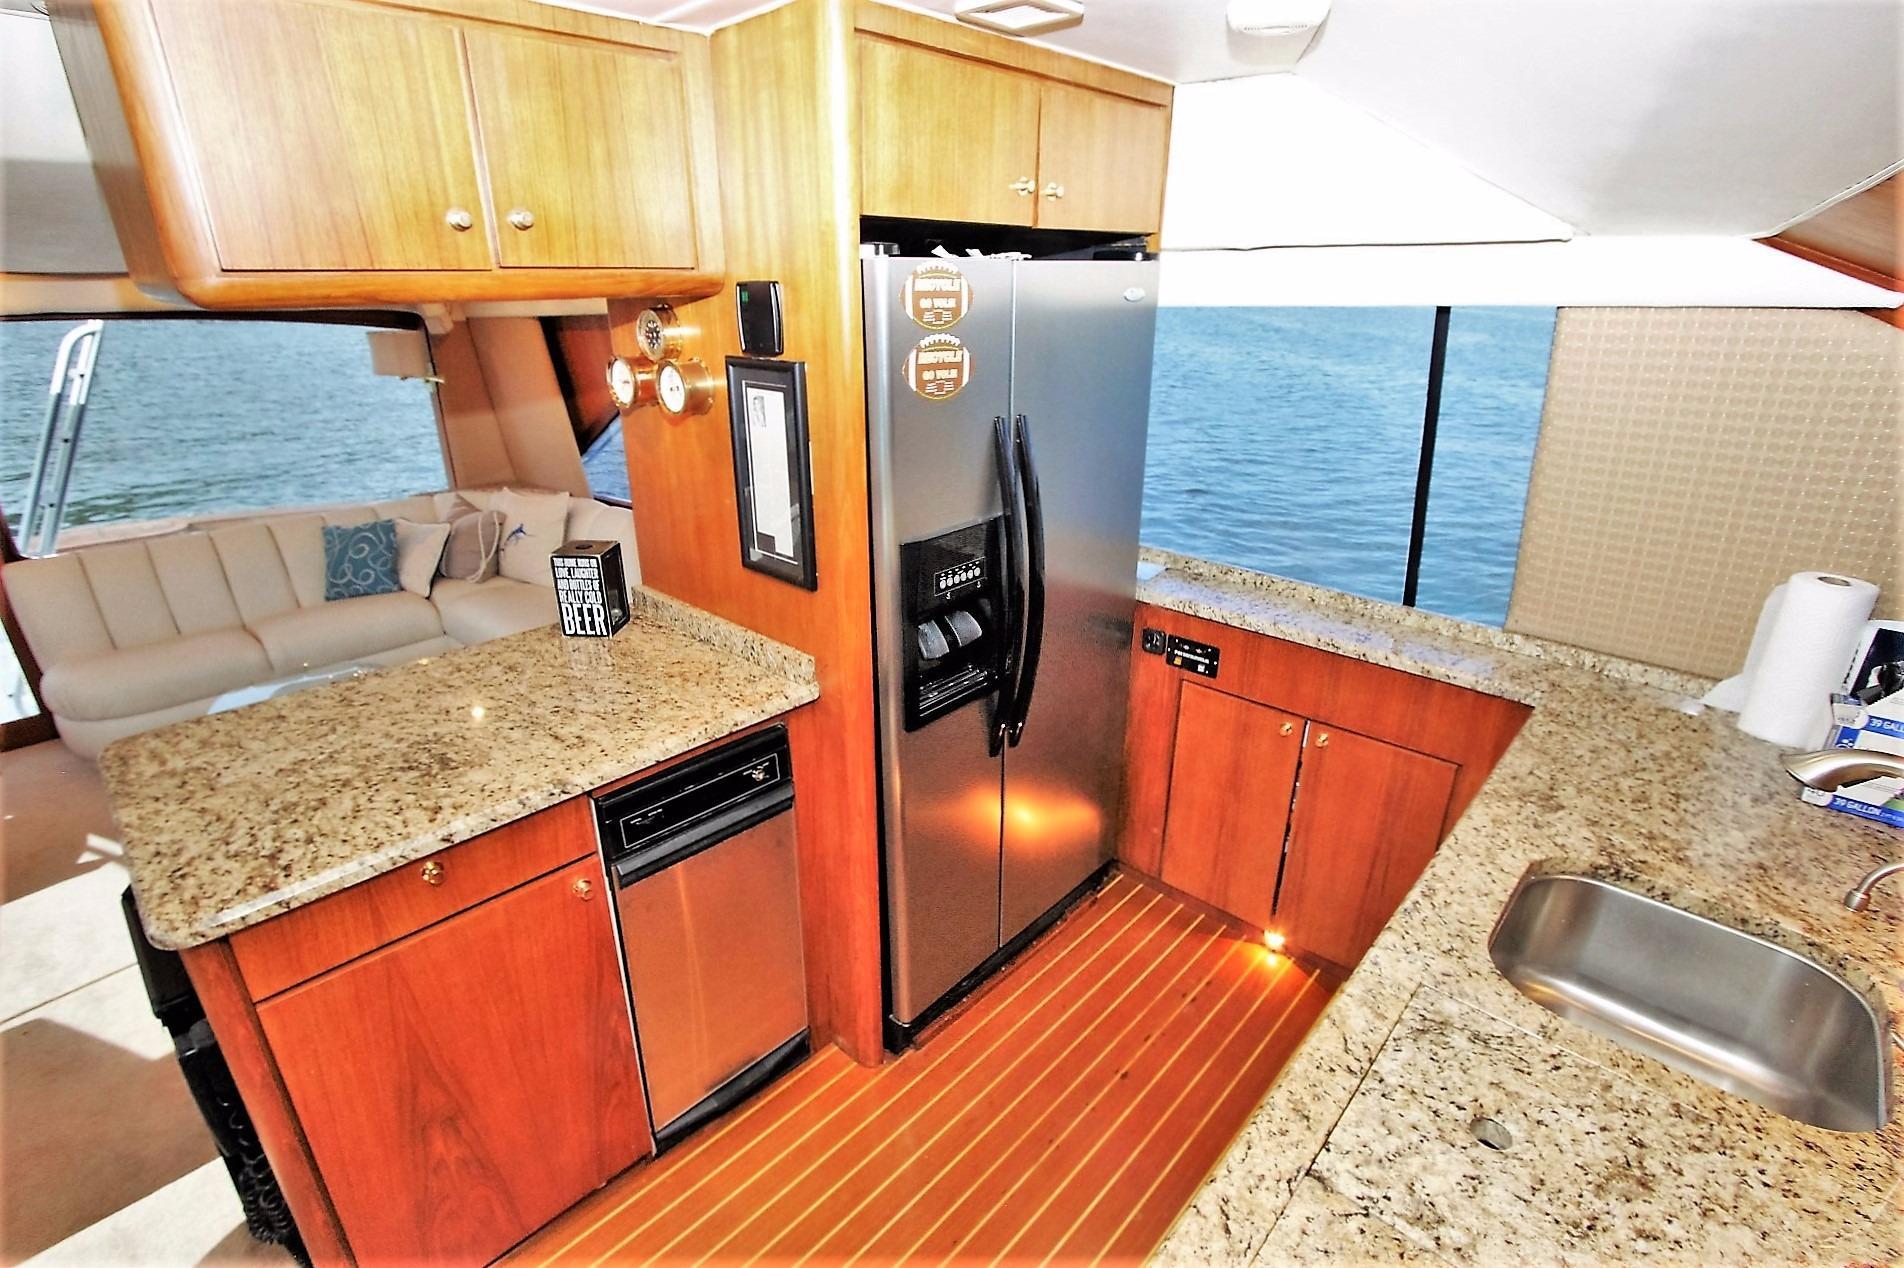 60 ocean yachts 1997 bikini atoll knoxville tennessee